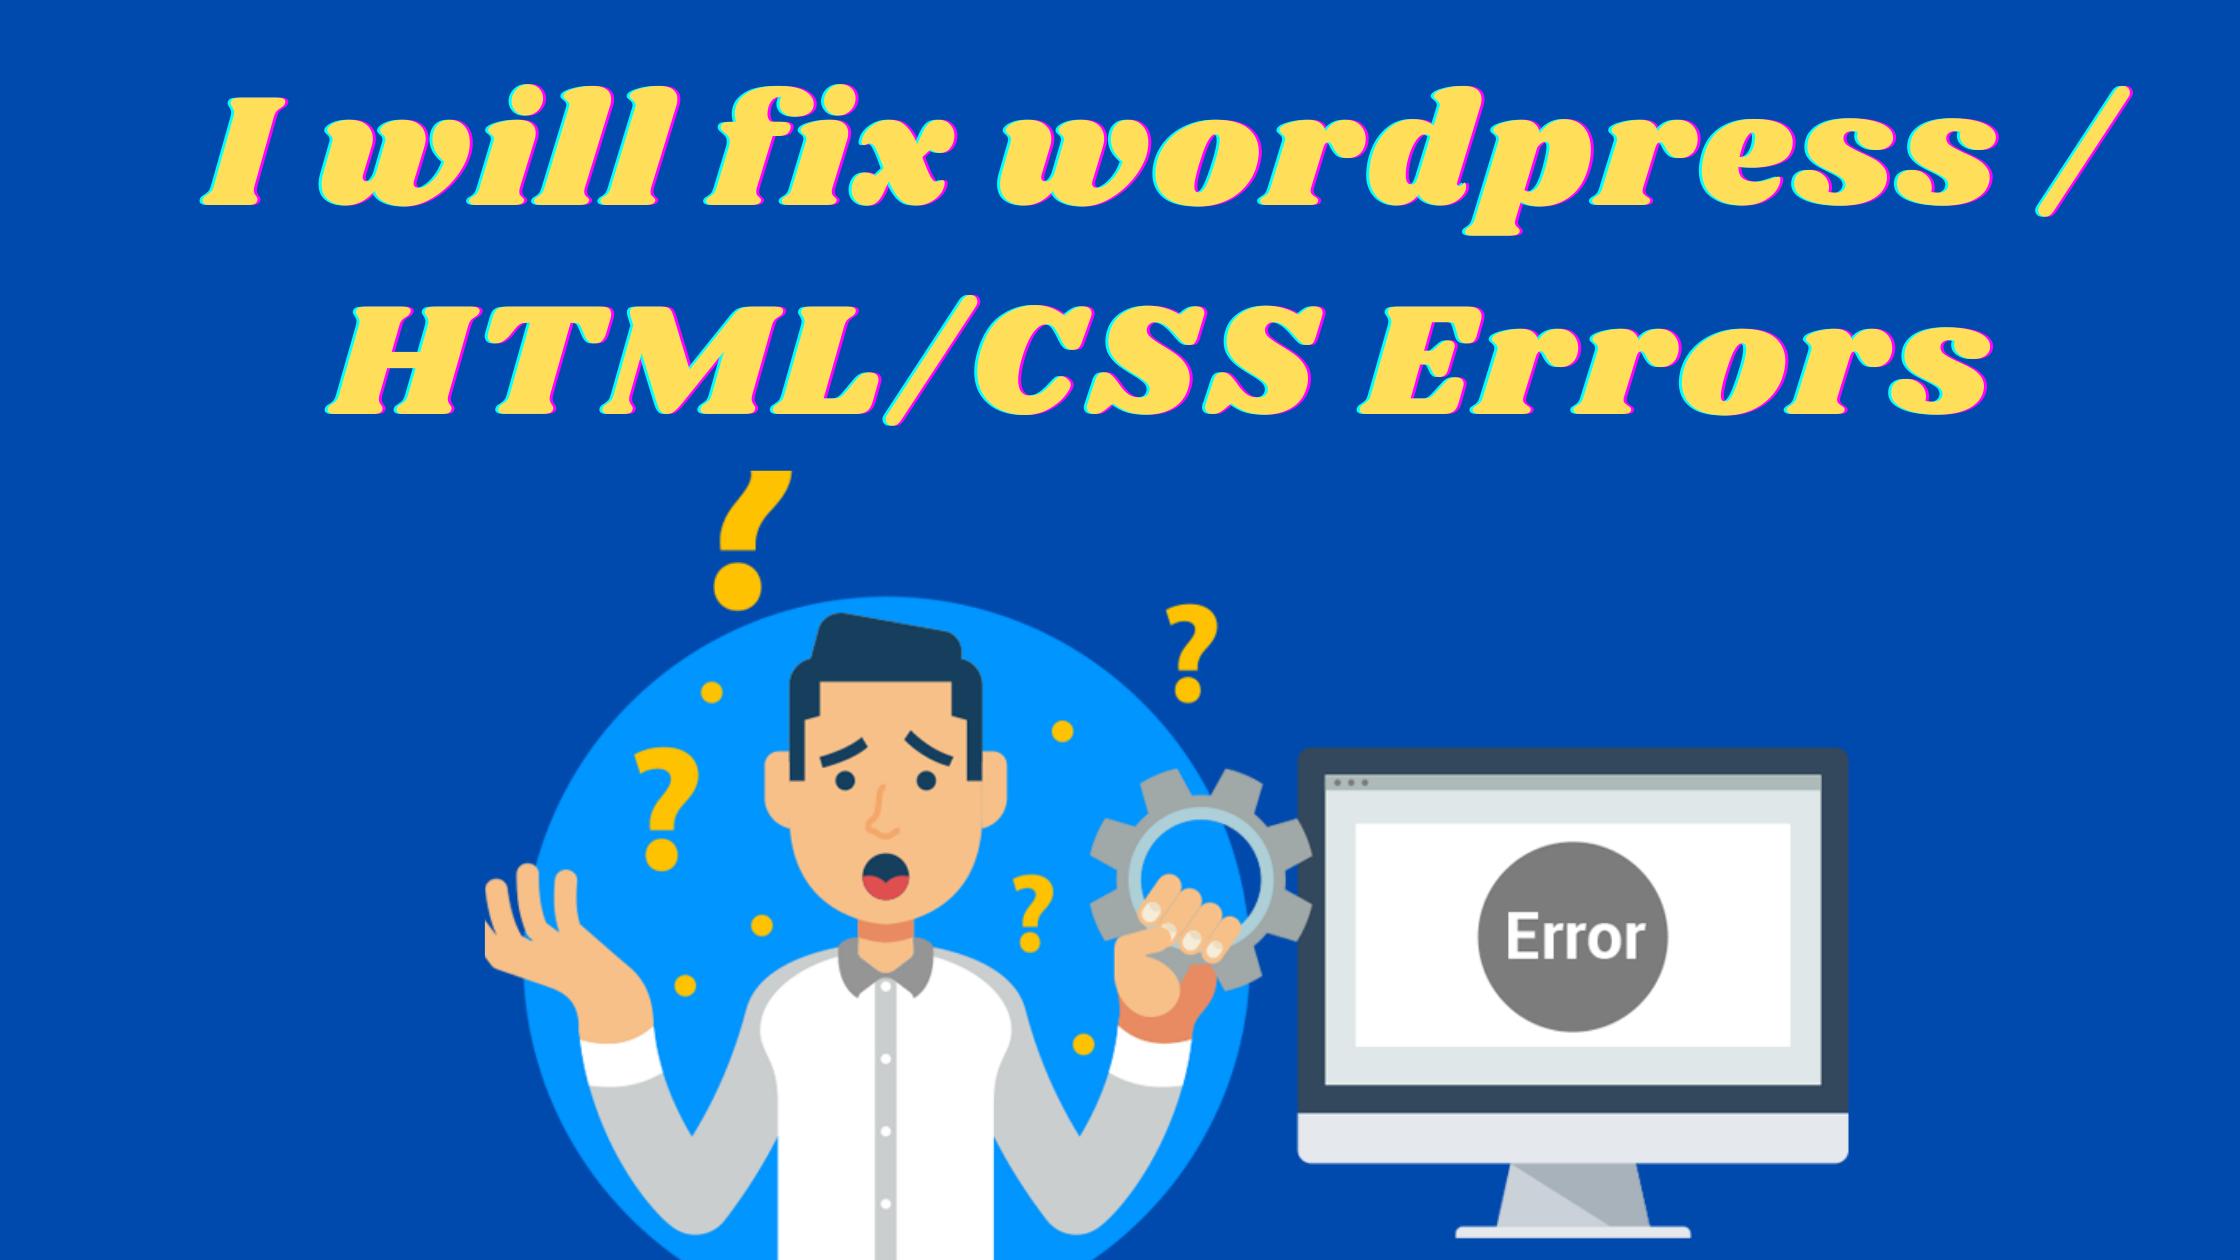 I will fix wordpress/html/css errors or bugs